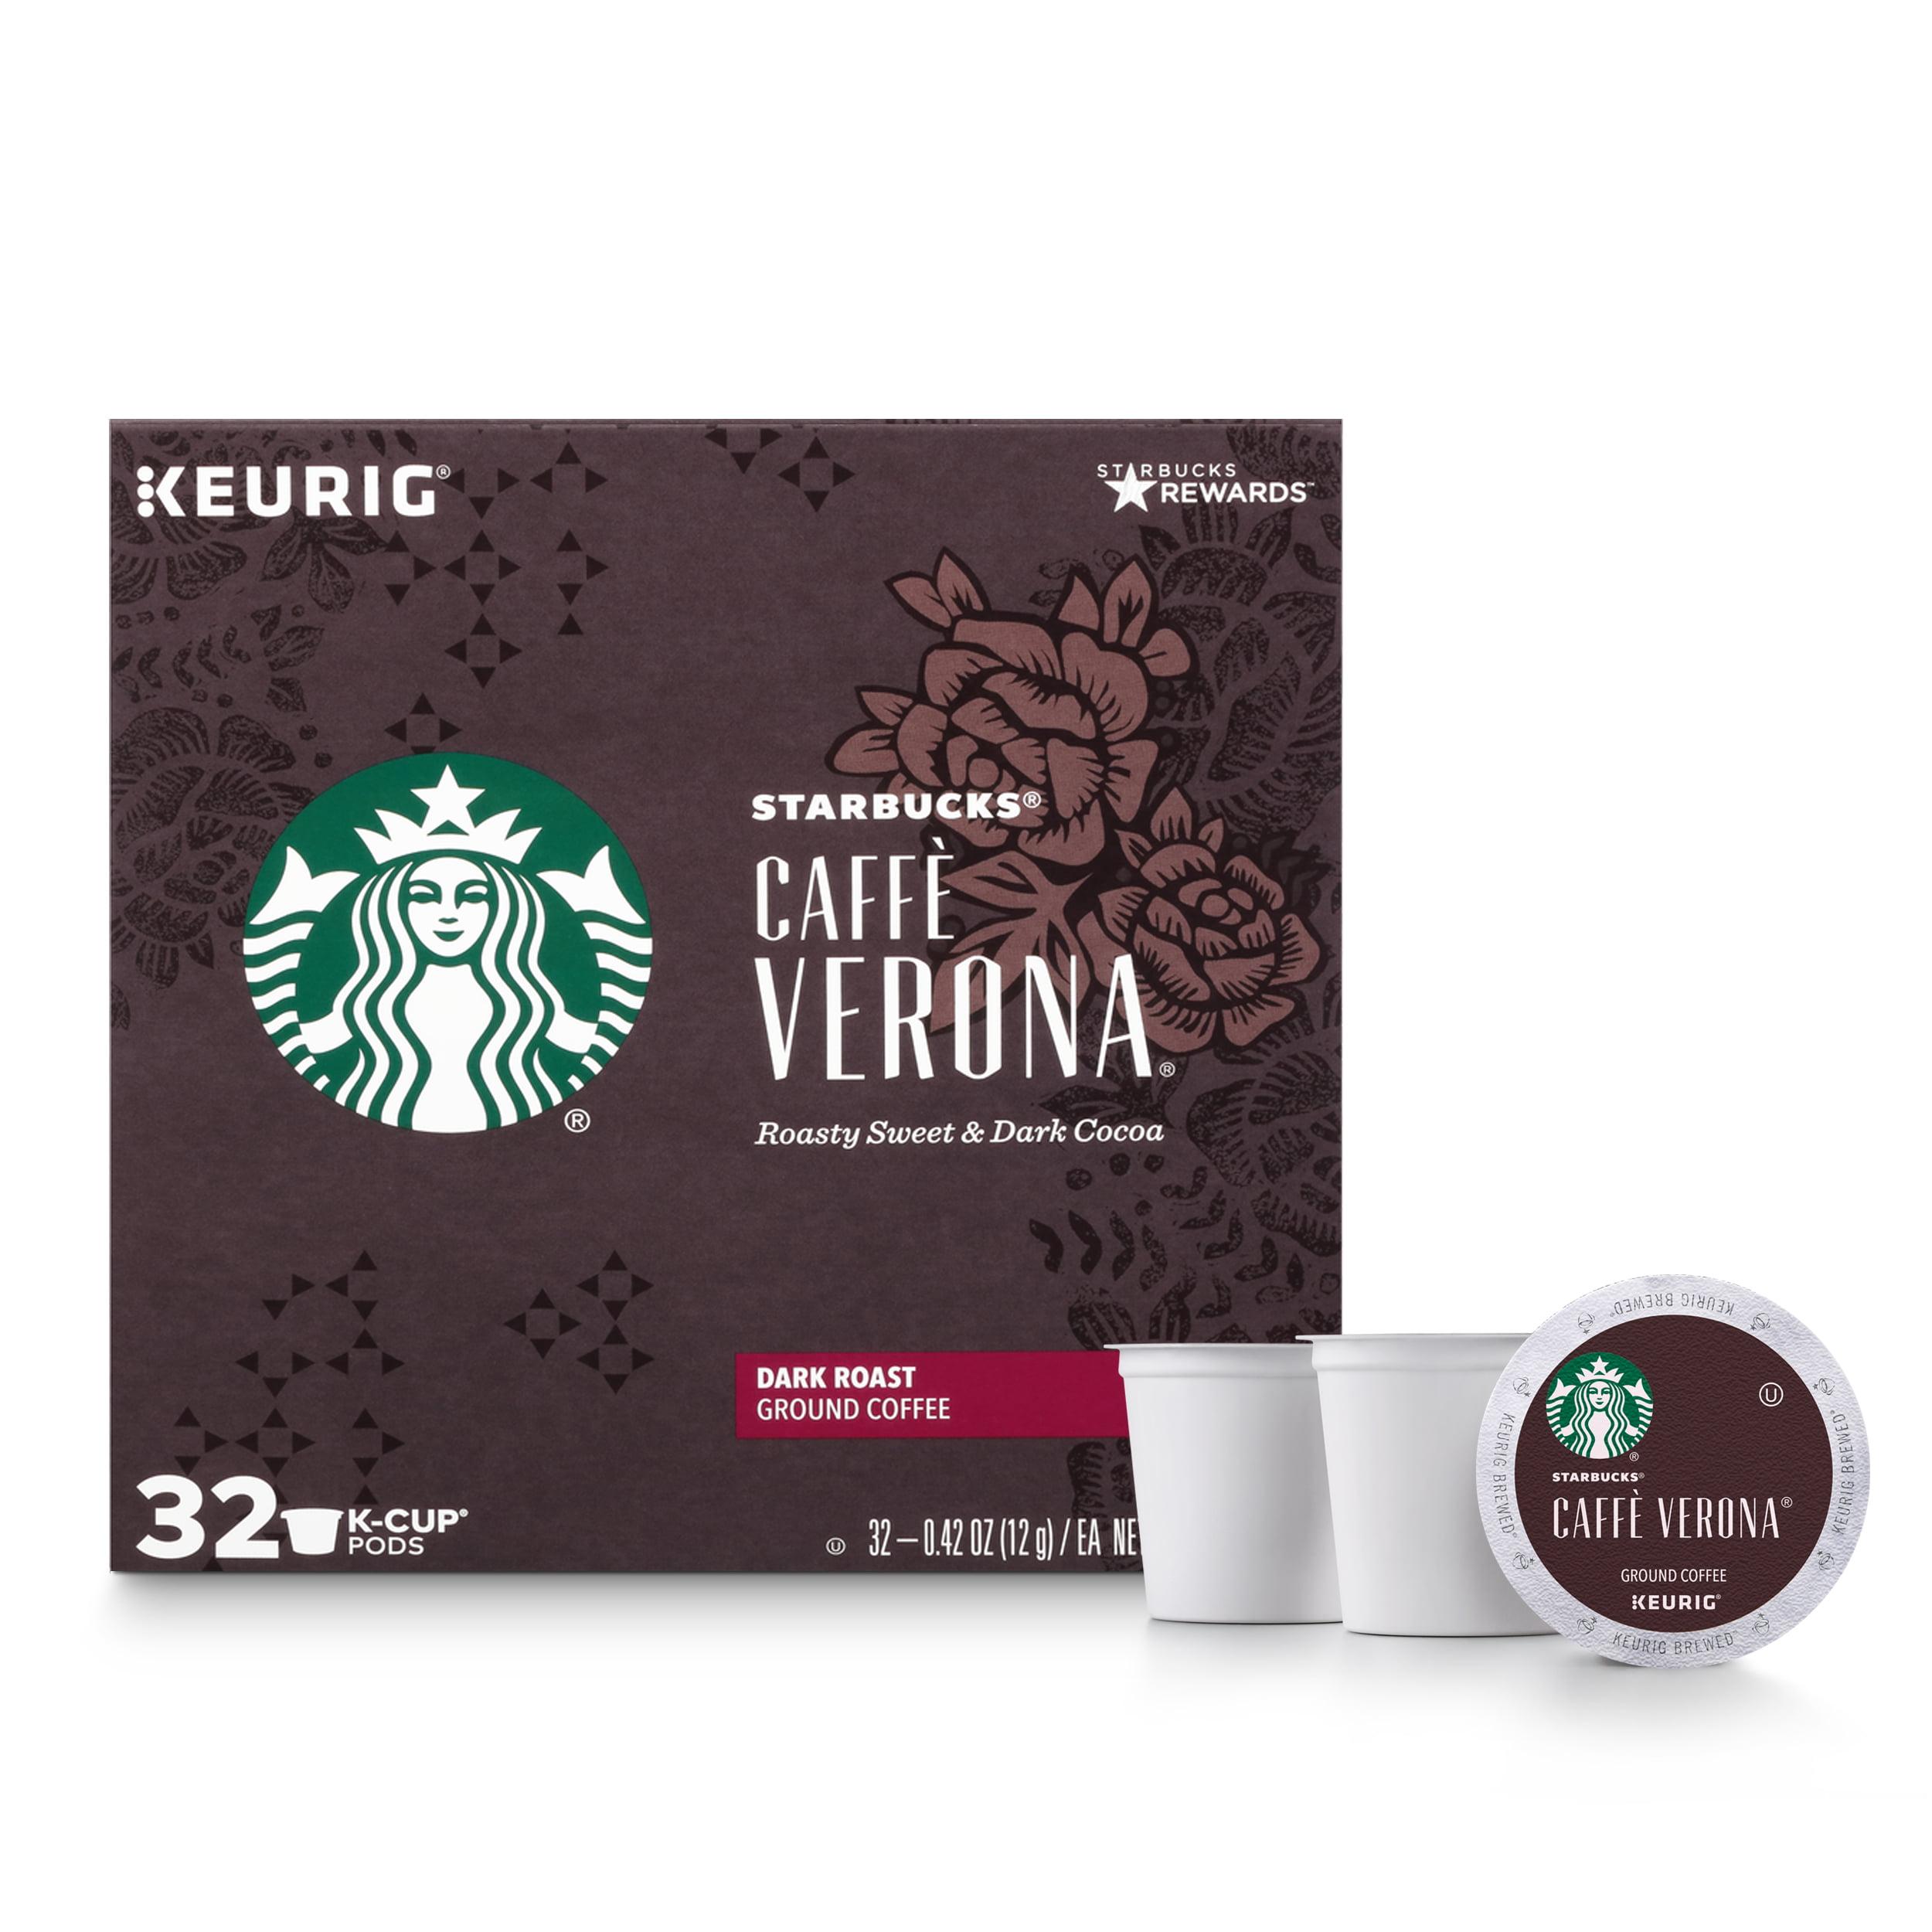 Starbucks Caffè Verona K-Cup Coffee Pods, Dark Roast, 32 Count